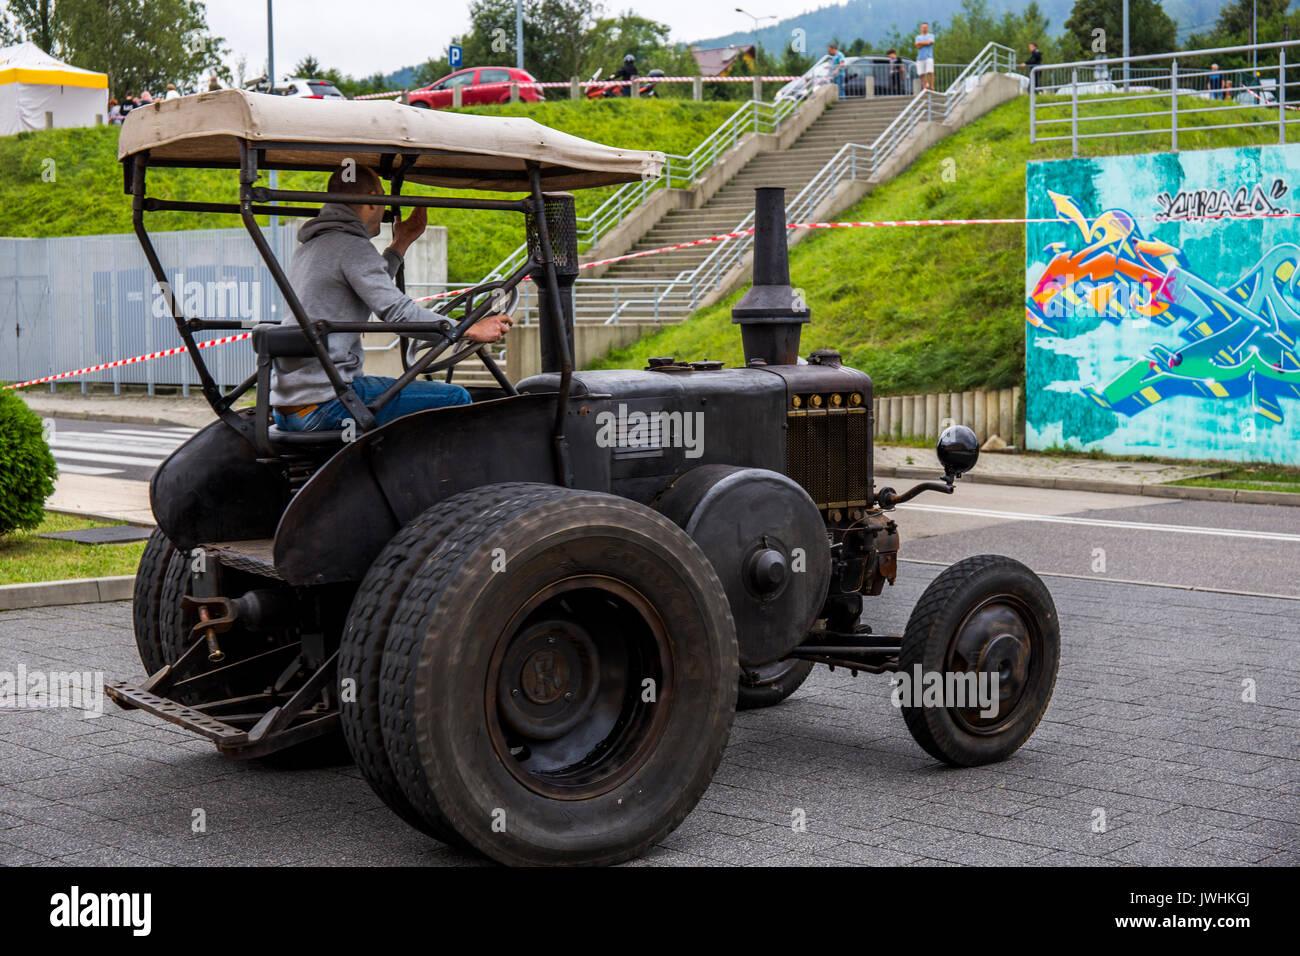 Bielsko-Biala, Poland. 12th Aug, 2017. International automotive trade fairs - MotoShow Bielsko-Biala. Man driving Stock Photo